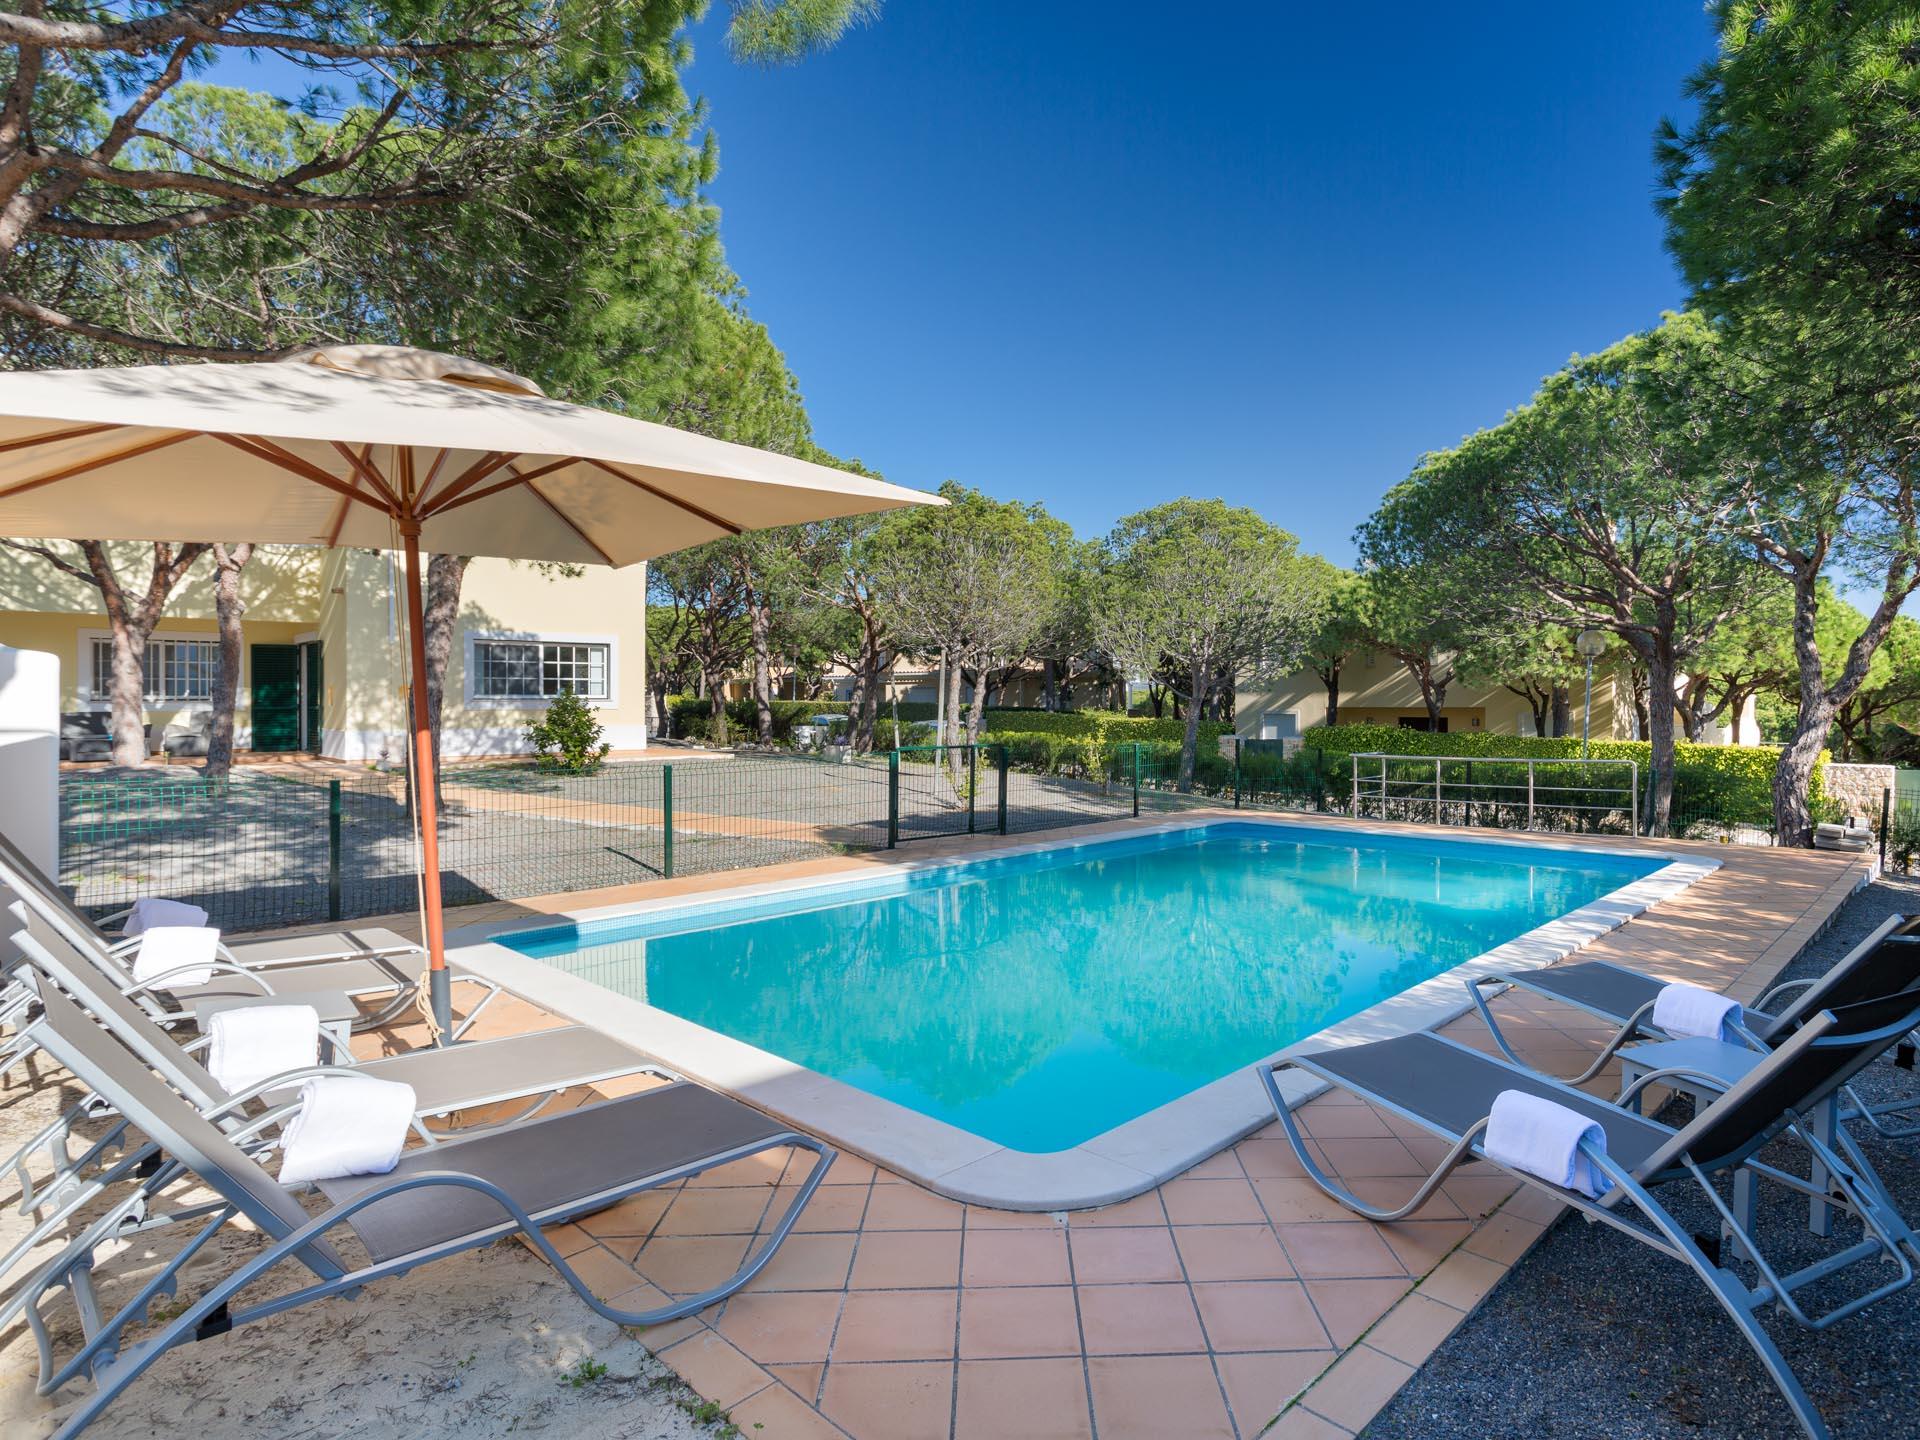 ferienhaus villa royal in castro marim portugal interhome. Black Bedroom Furniture Sets. Home Design Ideas